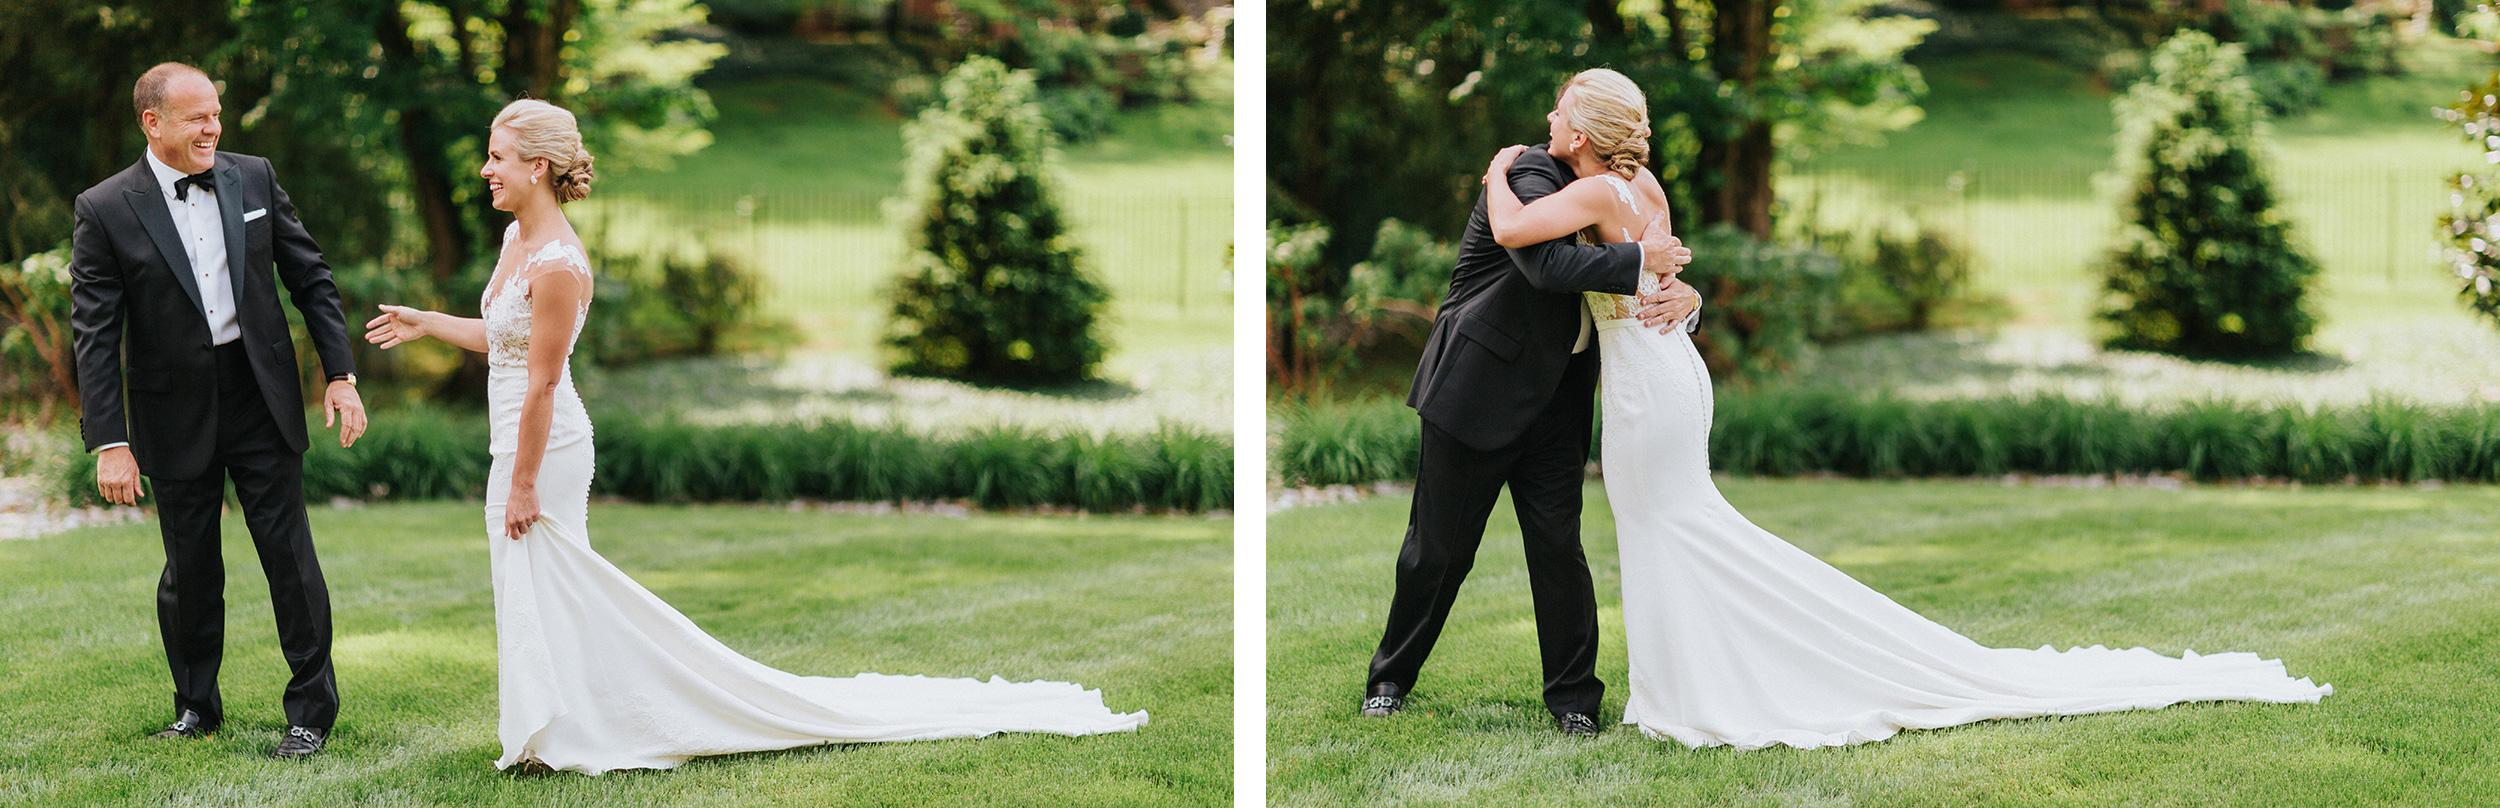 speed-art-museum-wedding-photographer-10.JPG